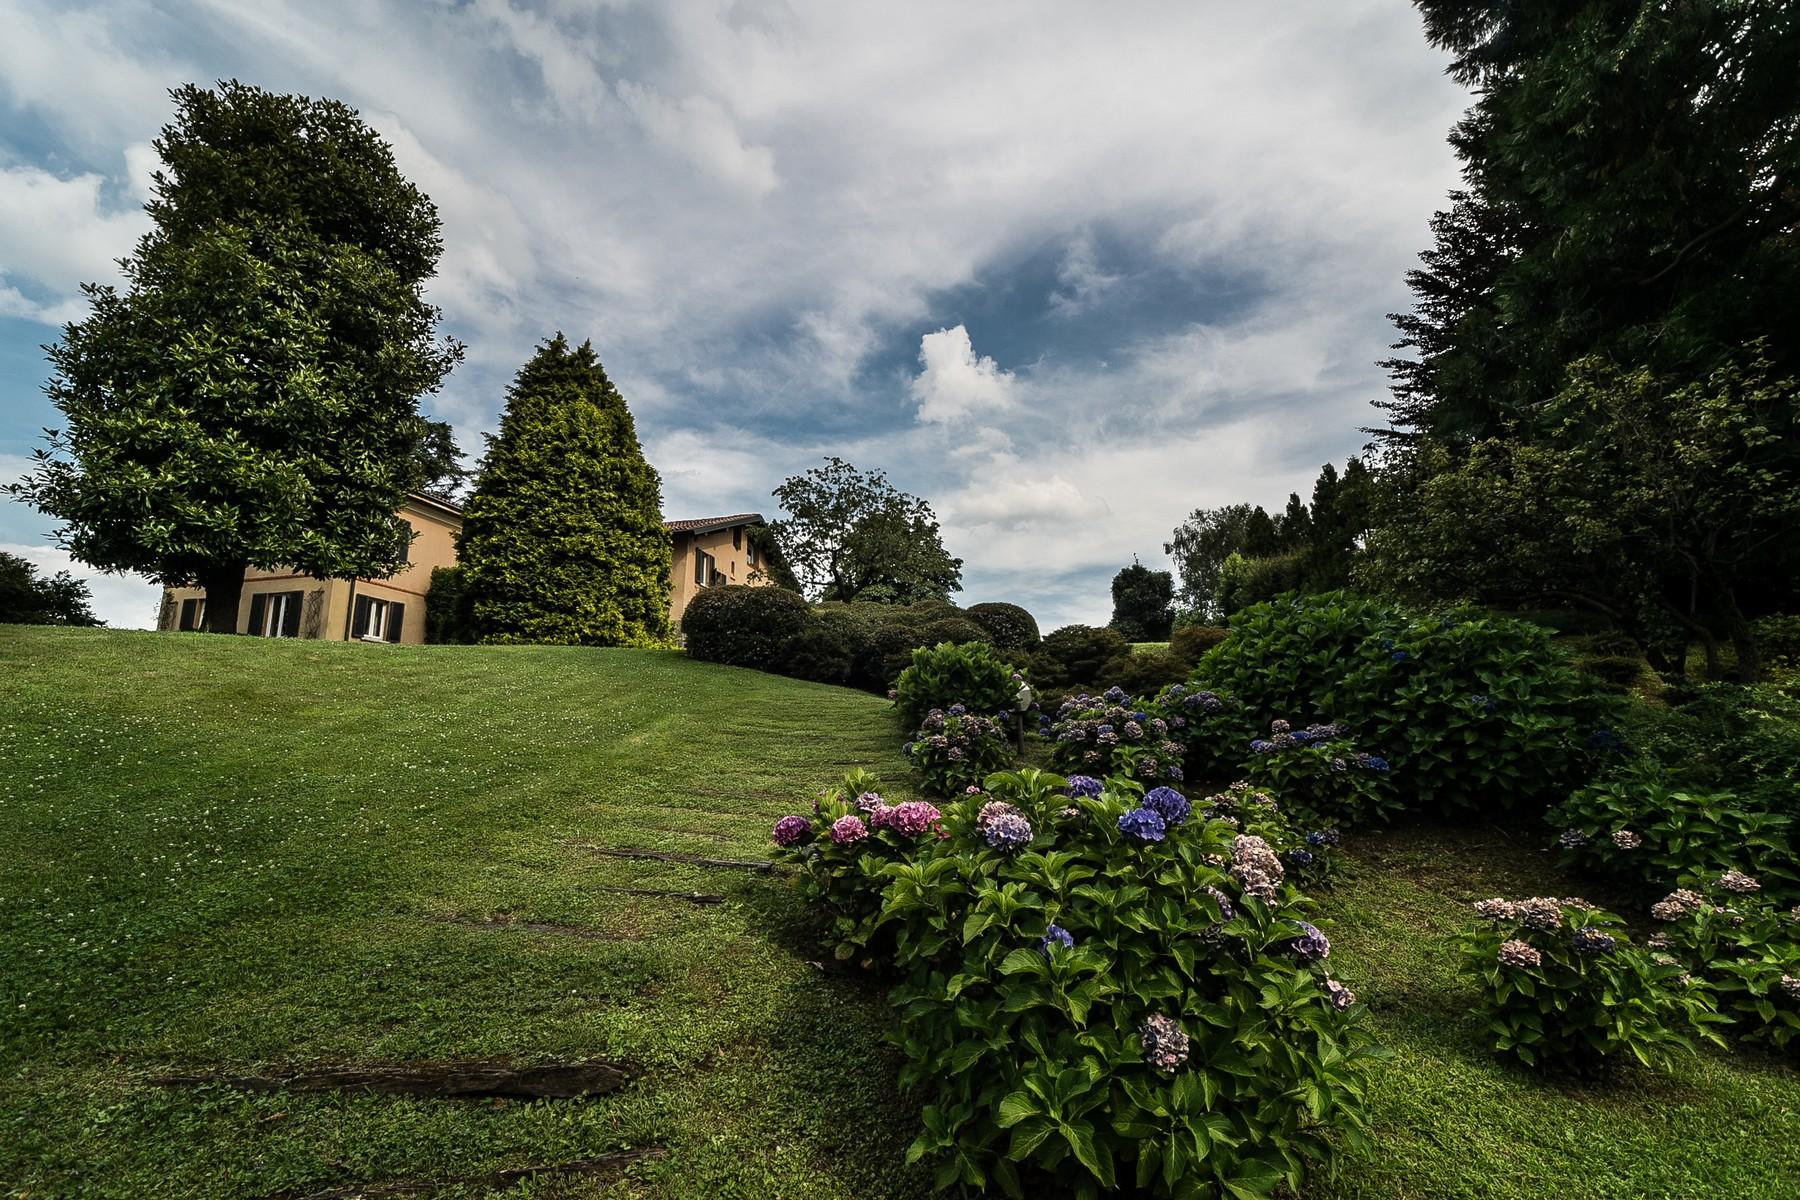 Villa in Vendita a Carimate: 5 locali, 800 mq - Foto 3